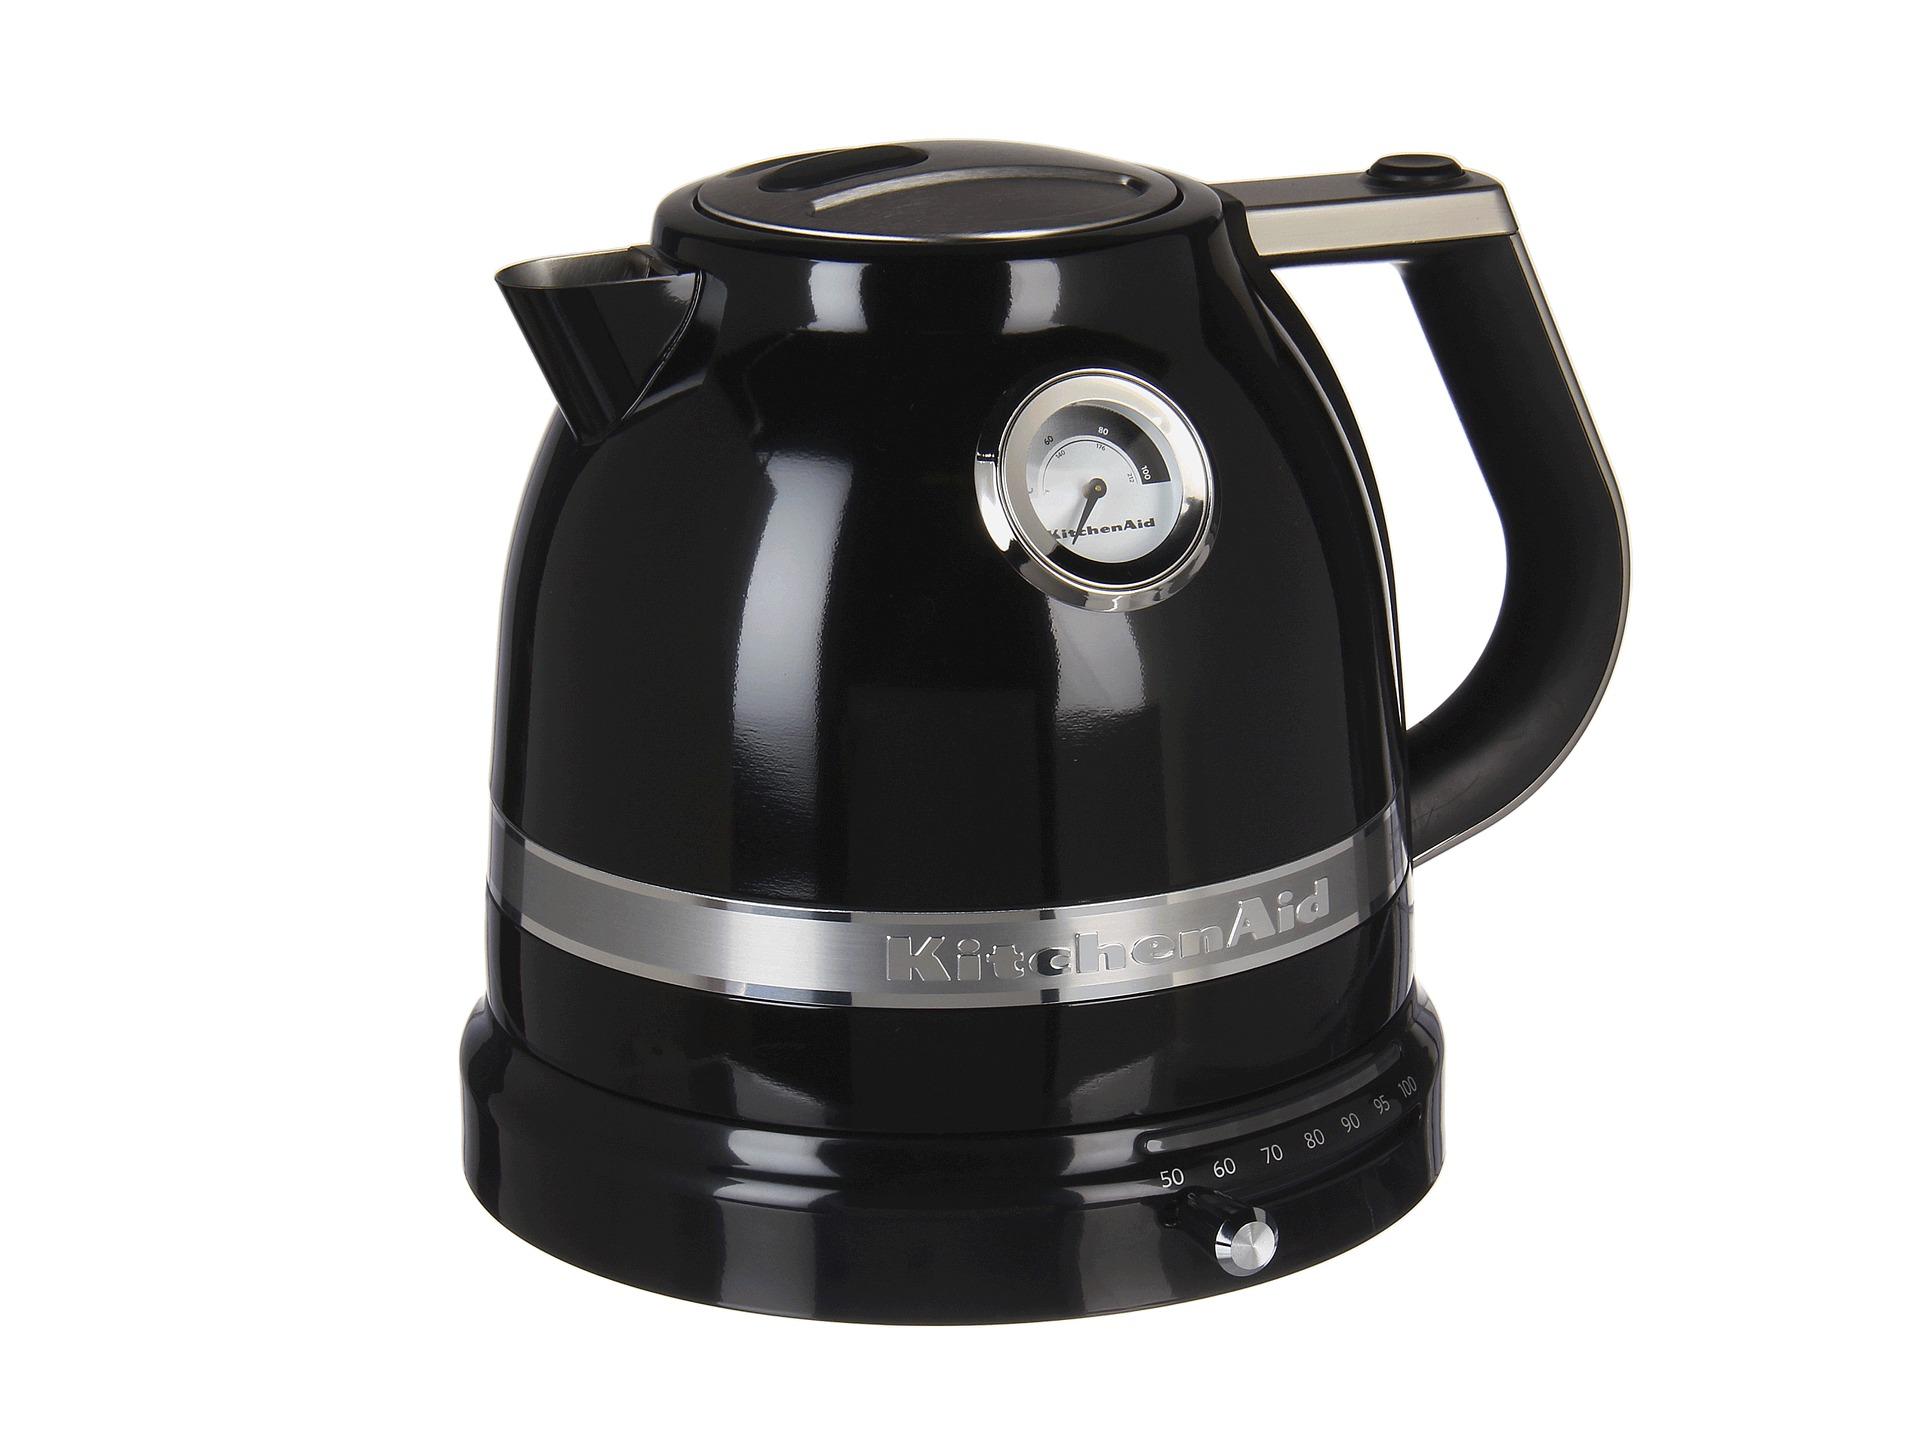 kitchenaid kitchenaid electric kettle